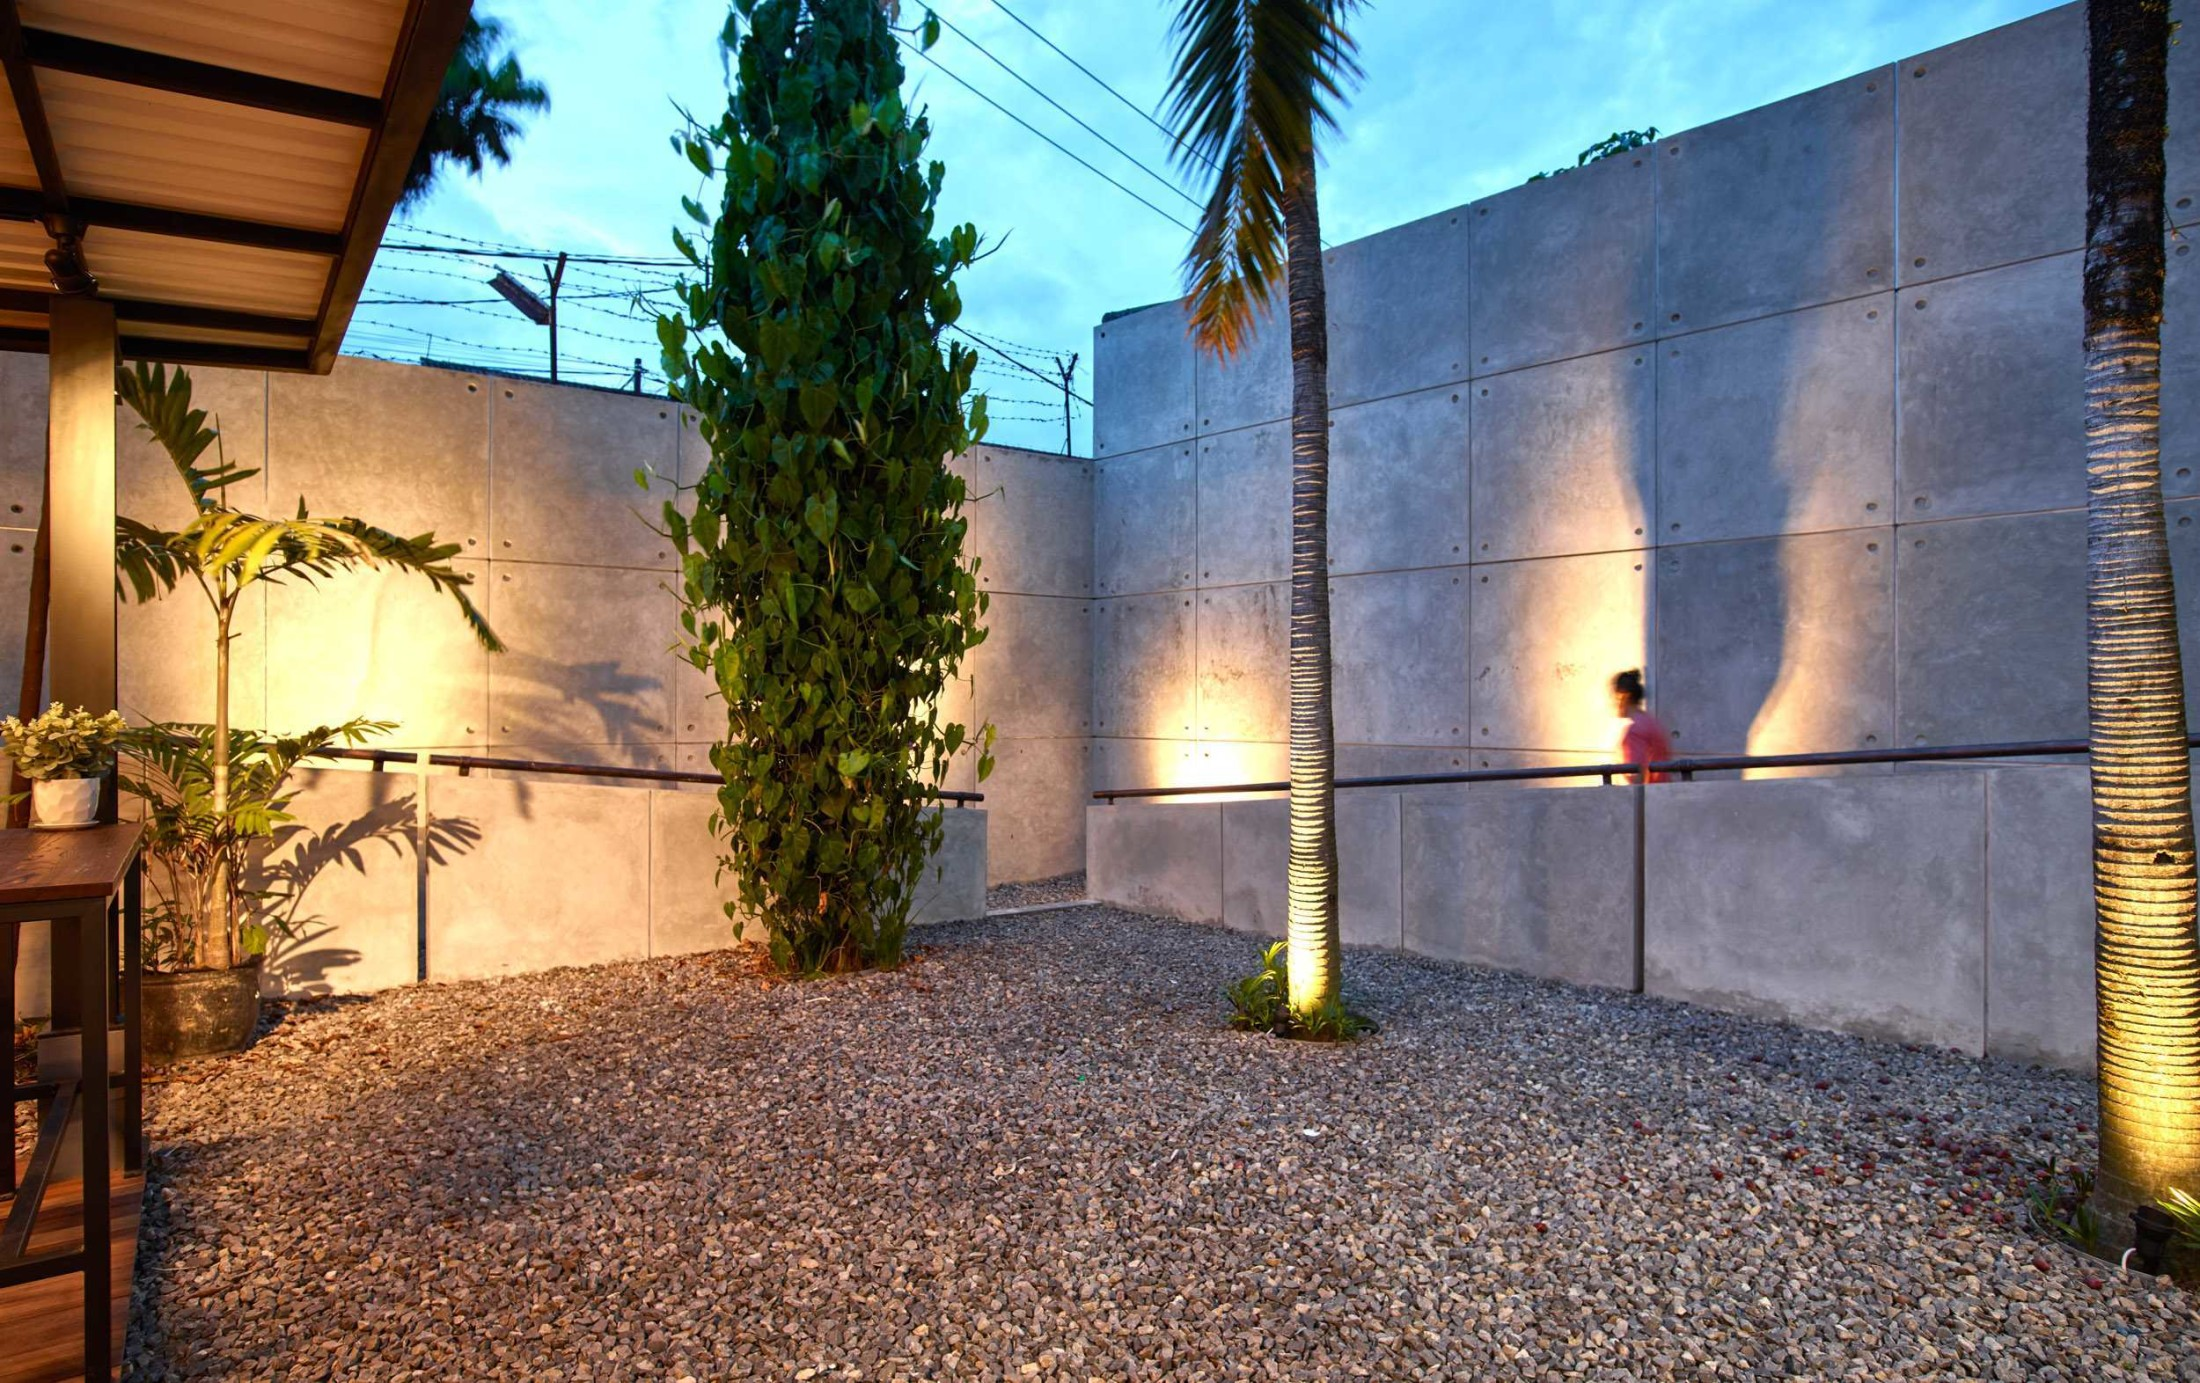 Taman kering dengan batu kerikil Cirangrang Bandung Office karya Dinardithen Studio (Sumber: arsitag.com)